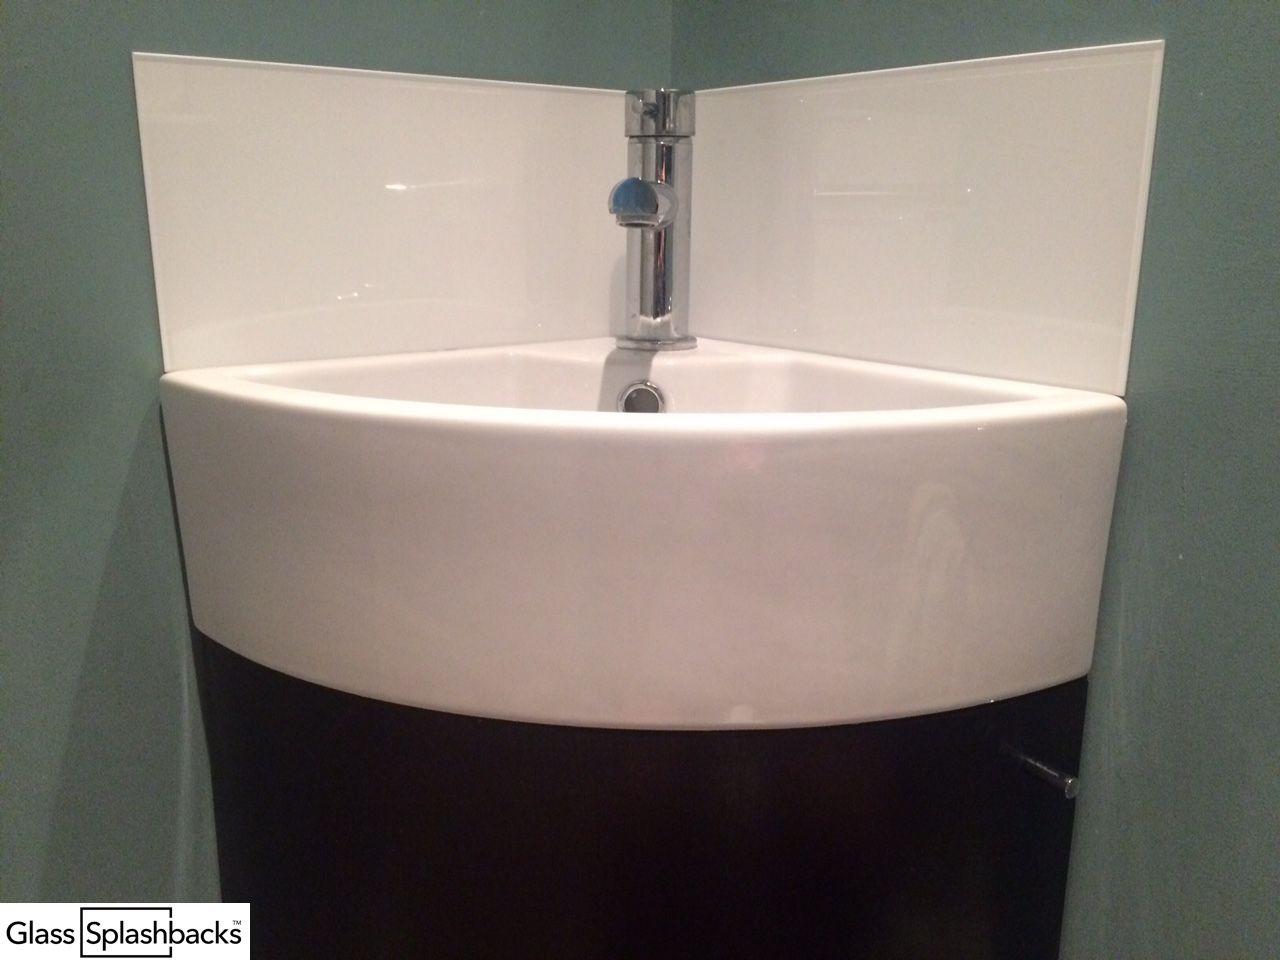 White Sink Splashback, On Corner Vanity Sink. We Create Bespoke Glass  Products In Any